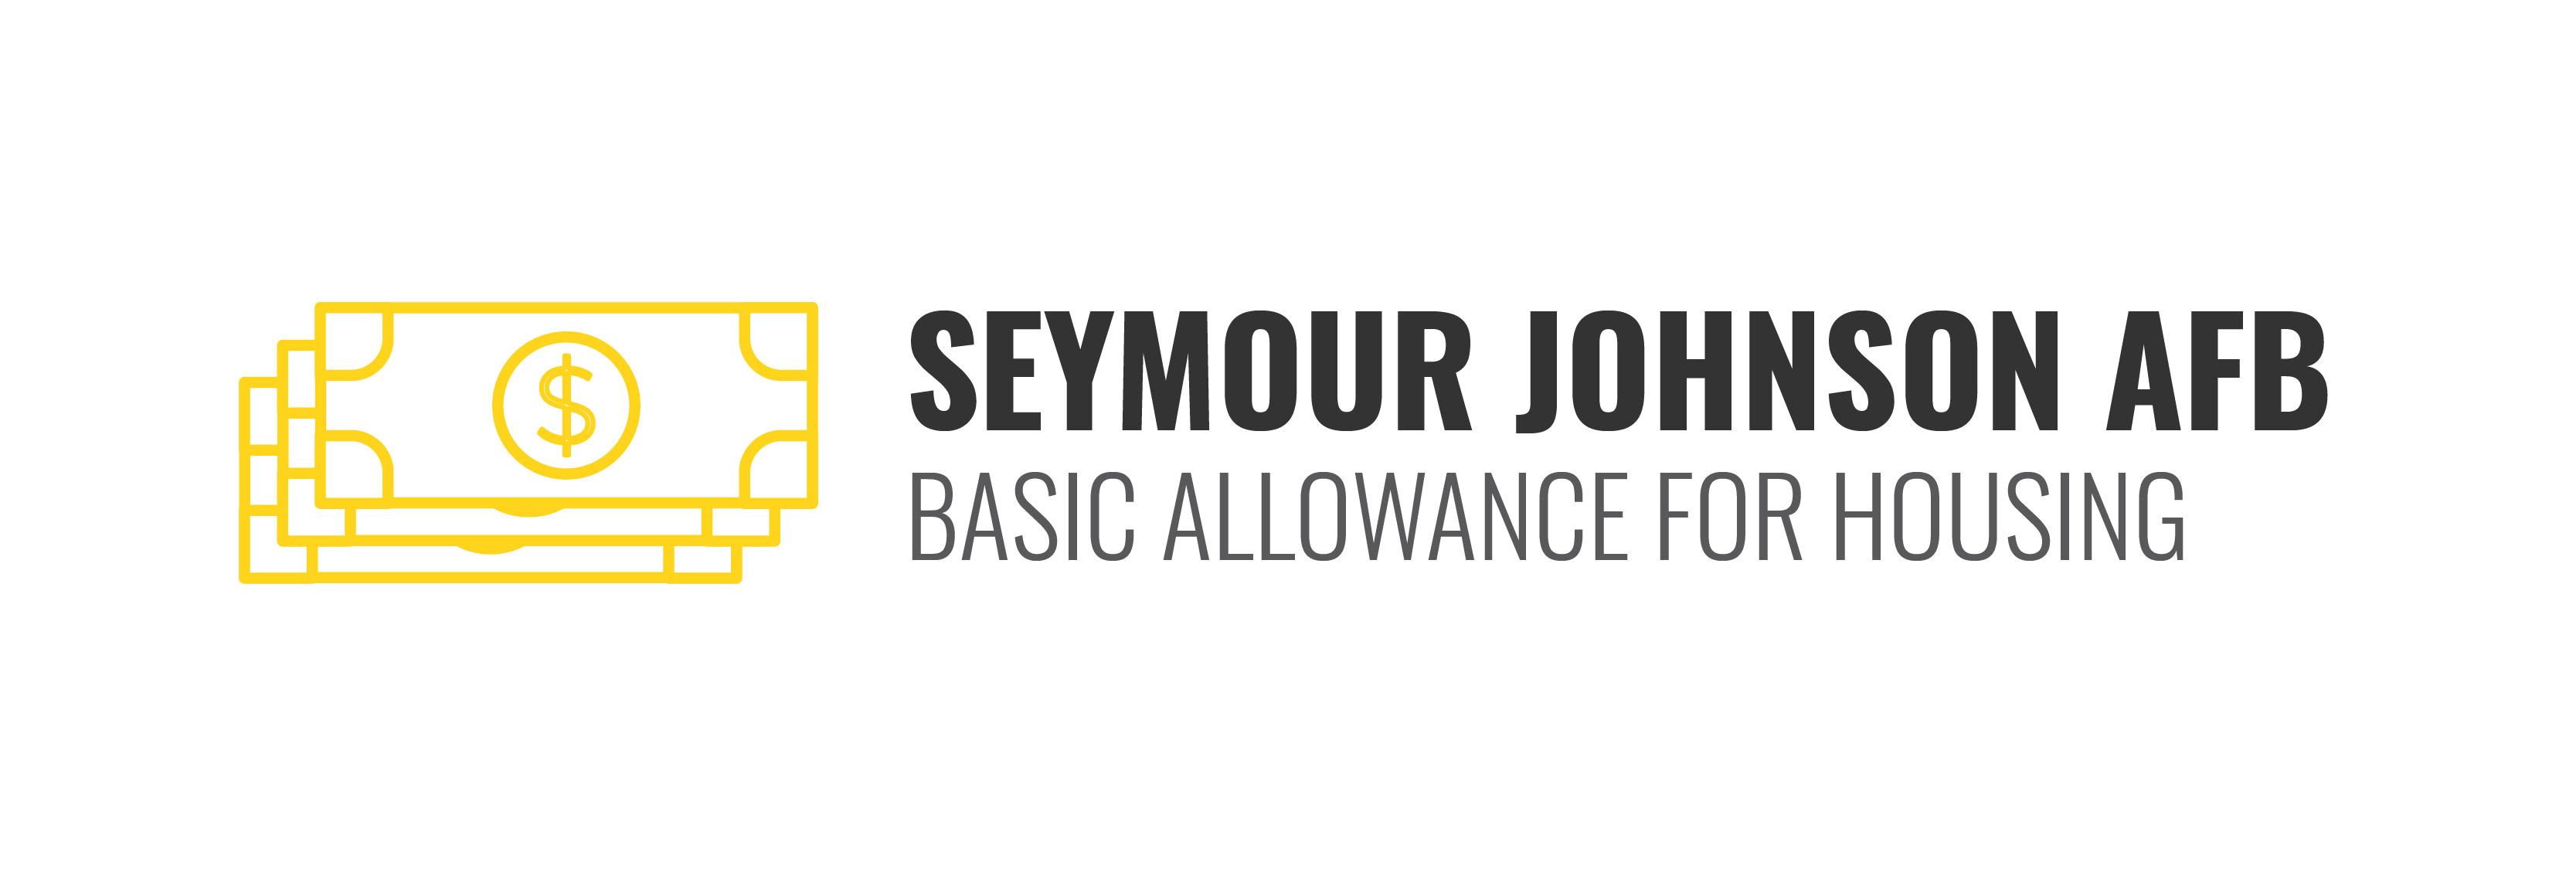 Seymour Johnson AFB BAH